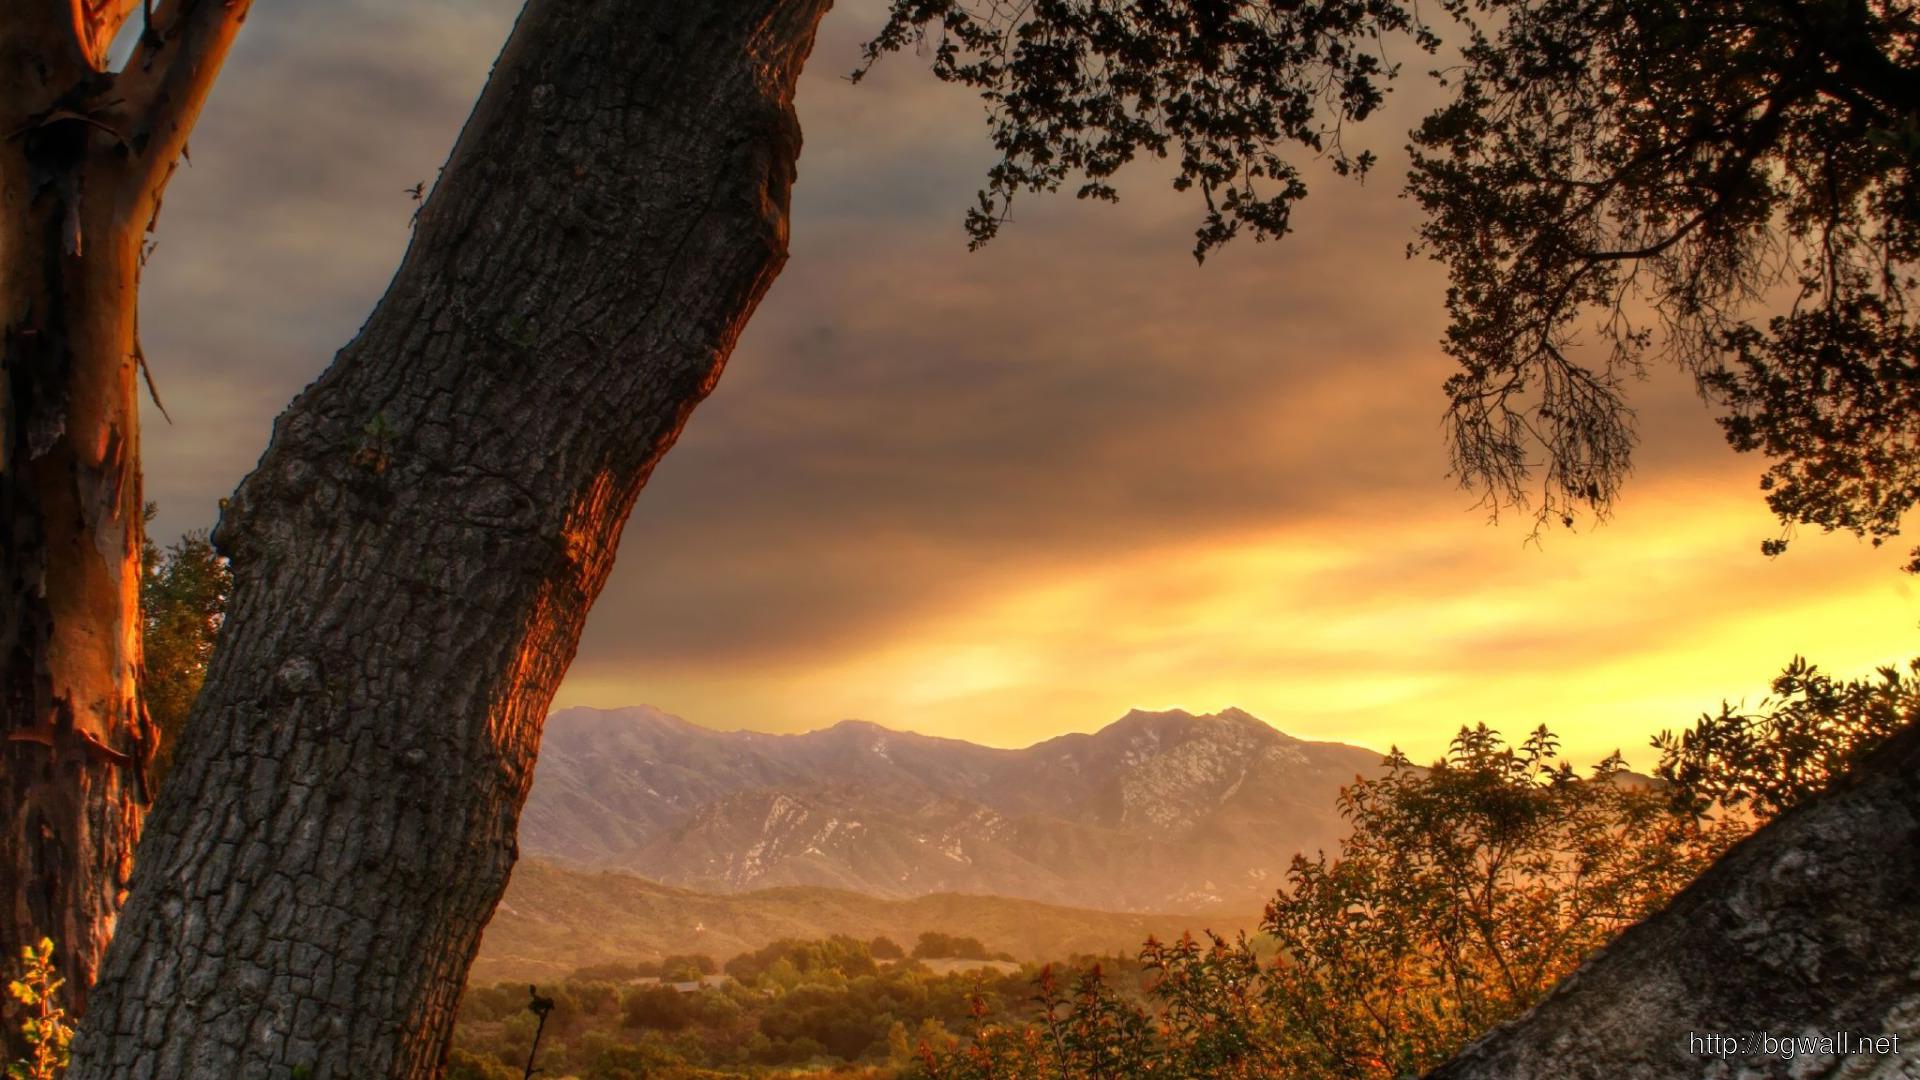 Mountain Sunset Wallpaper 2412 Full Size